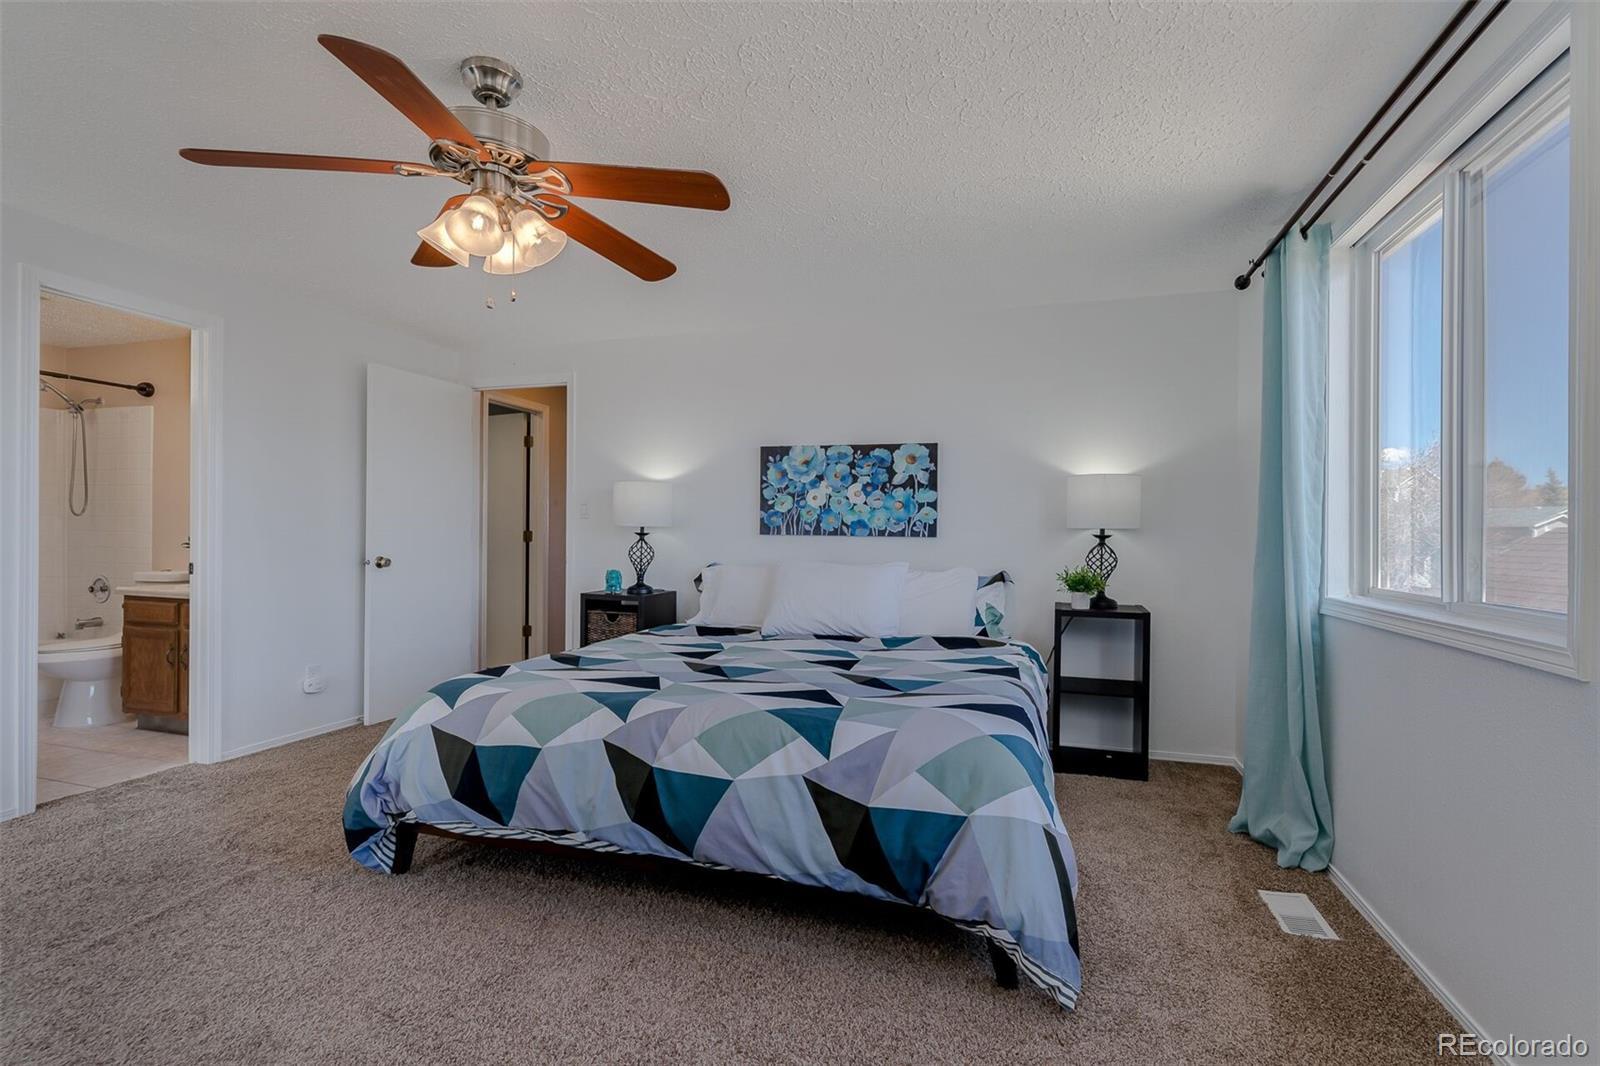 MLS# 8425770 - 29 - 6925 Battle Mountain Road, Colorado Springs, CO 80922